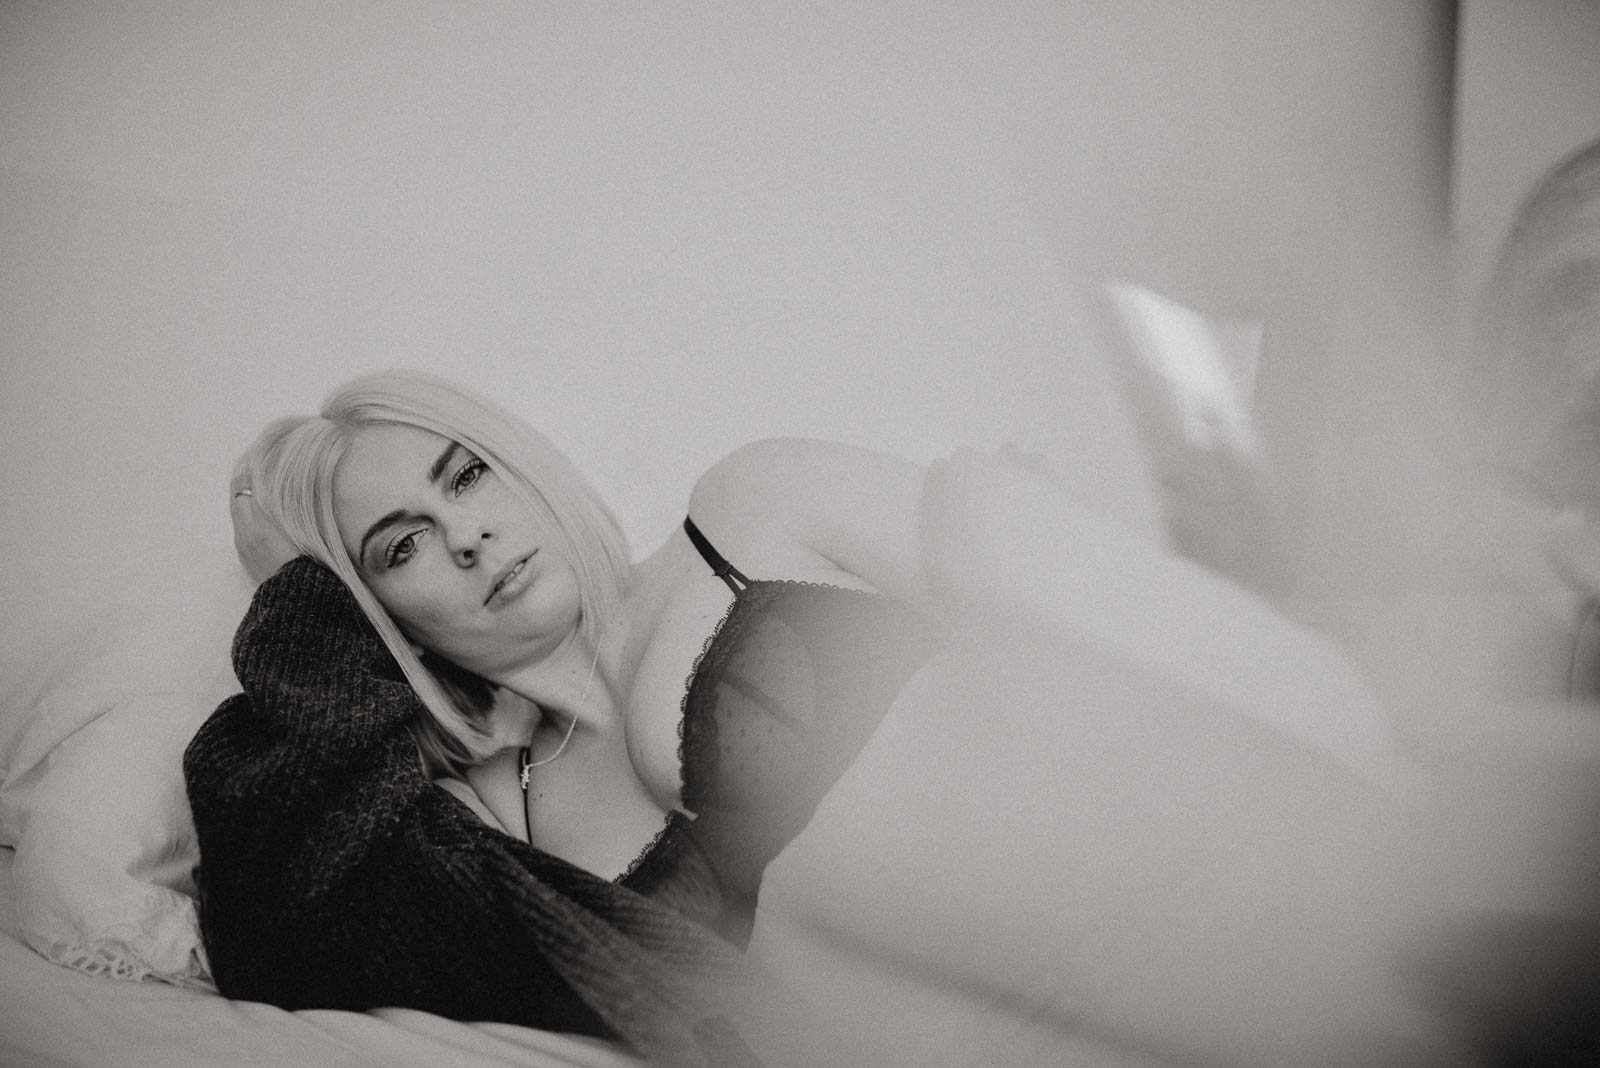 013-fotoshooting boudoir mit lipoedem als homeshooting_